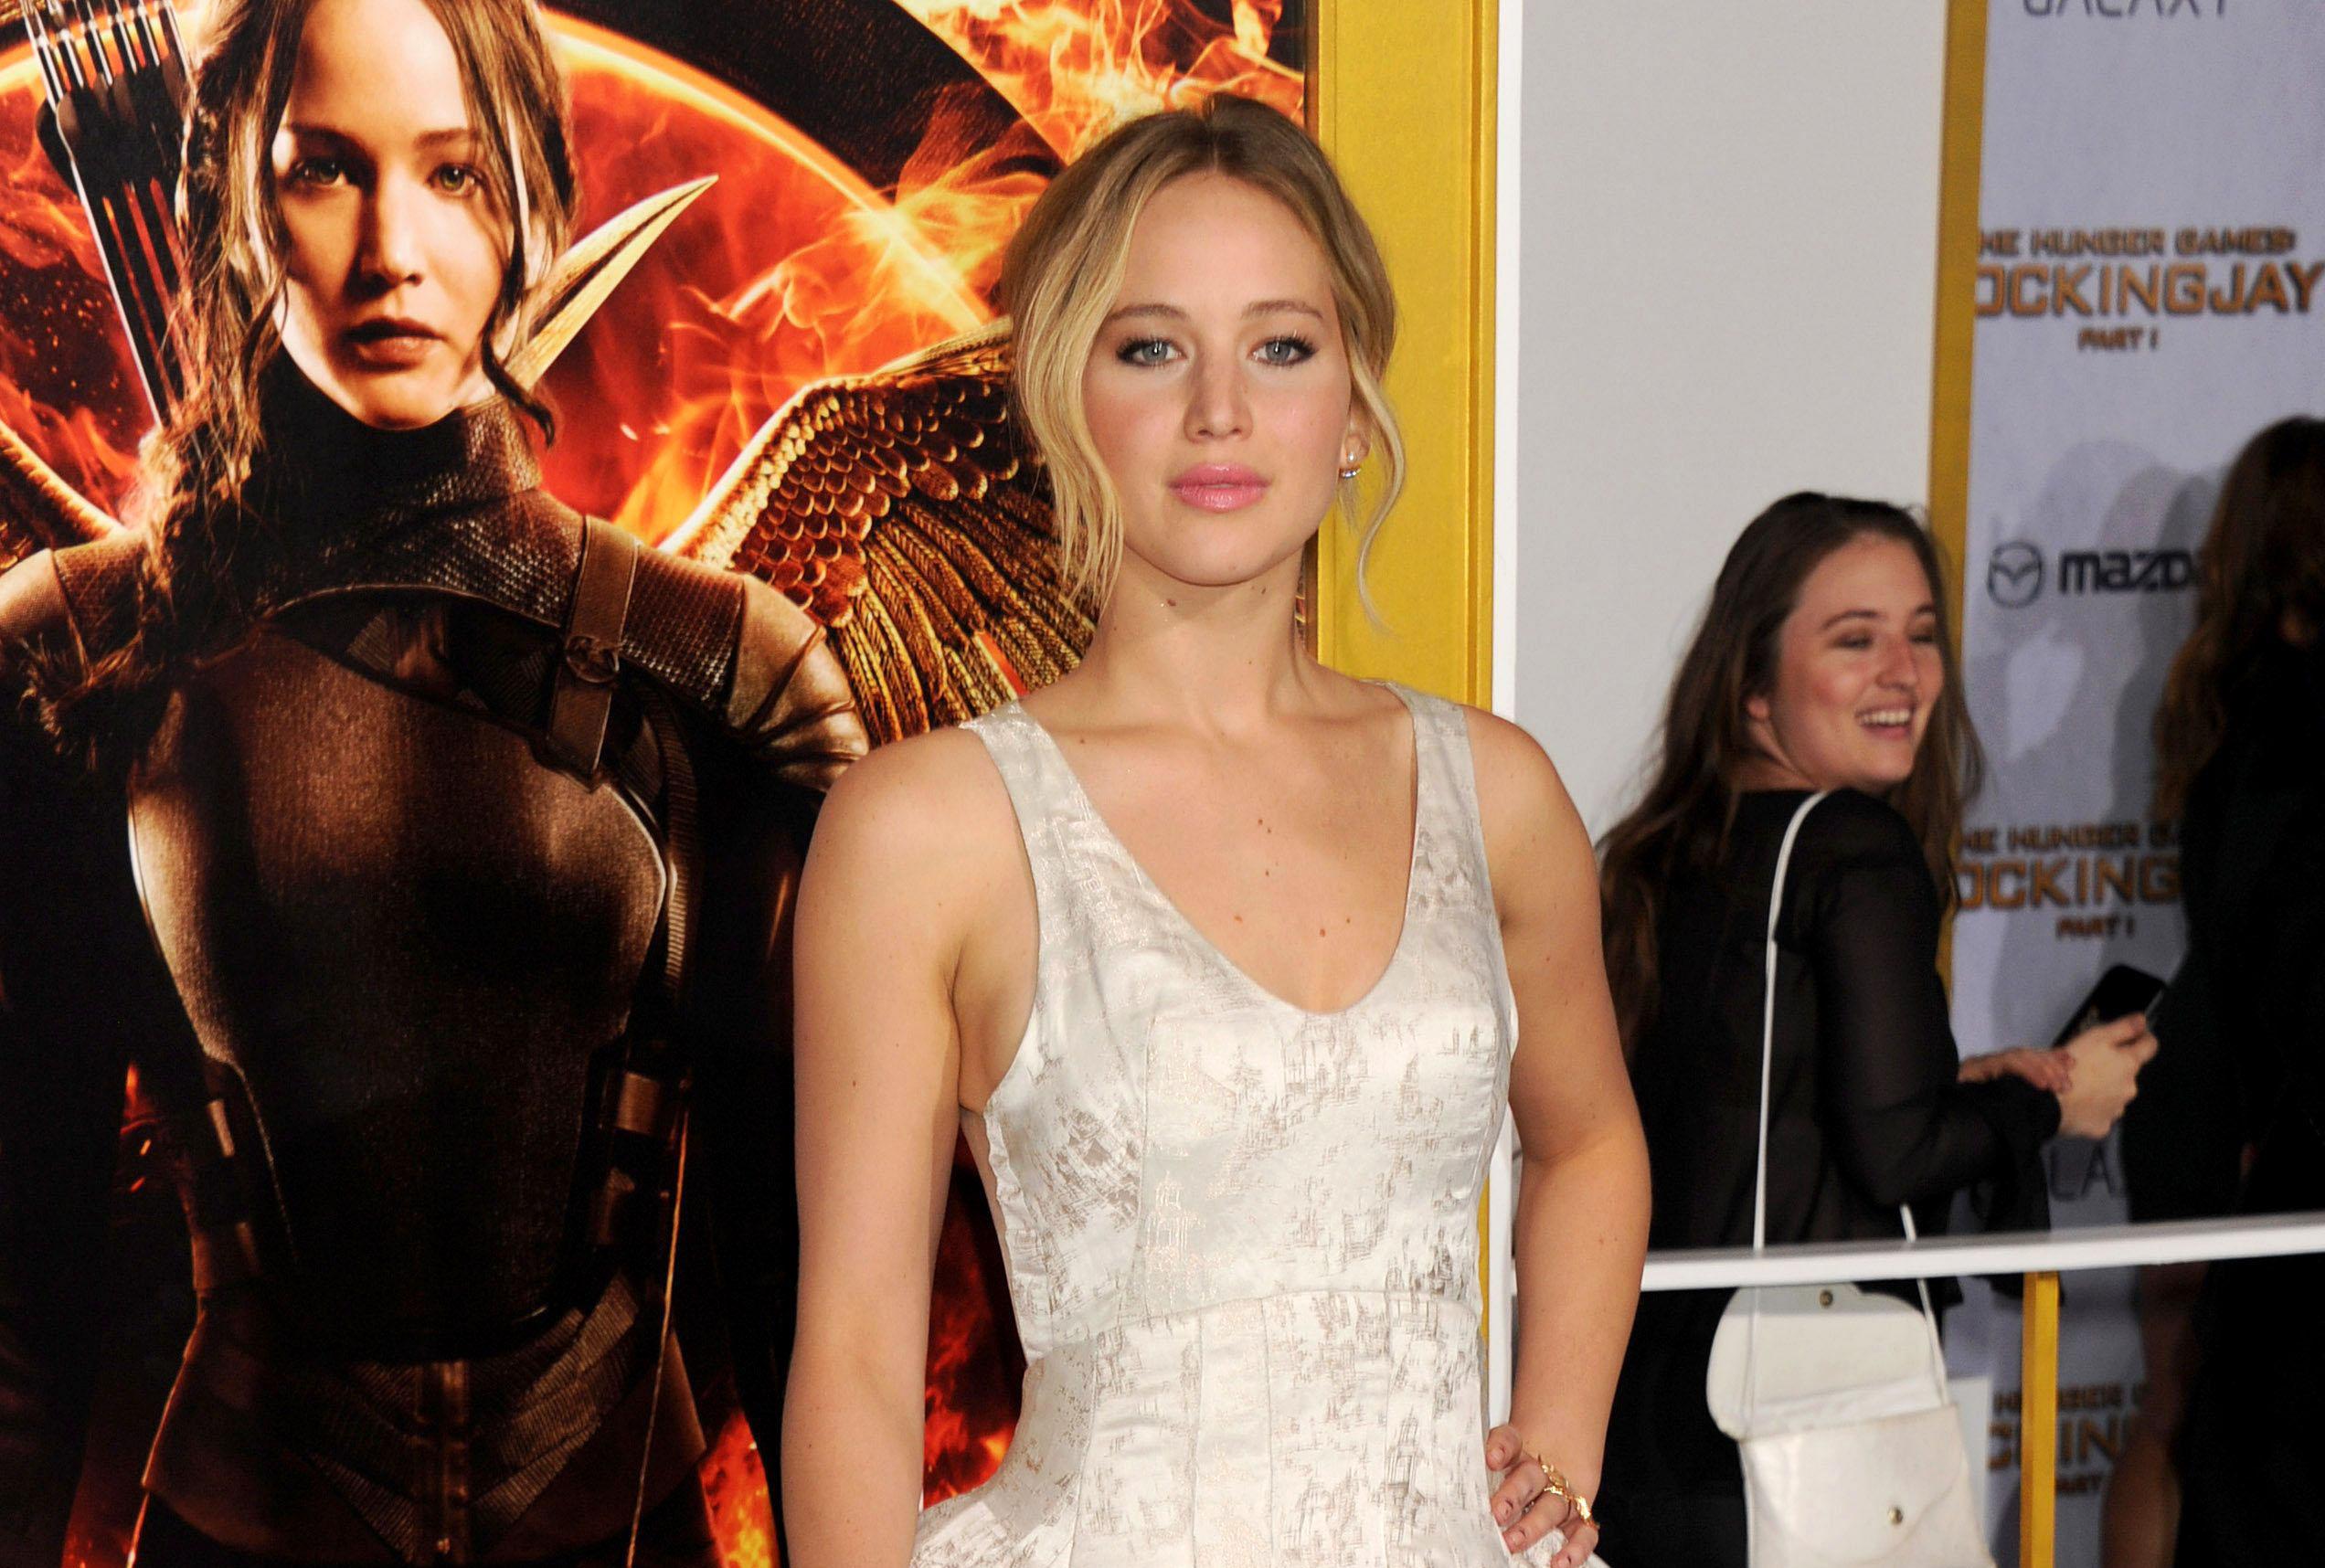 'The Hunger Games: Mockingjay Part 1' film premiere, Los Angeles, America - 17 Nov 2014